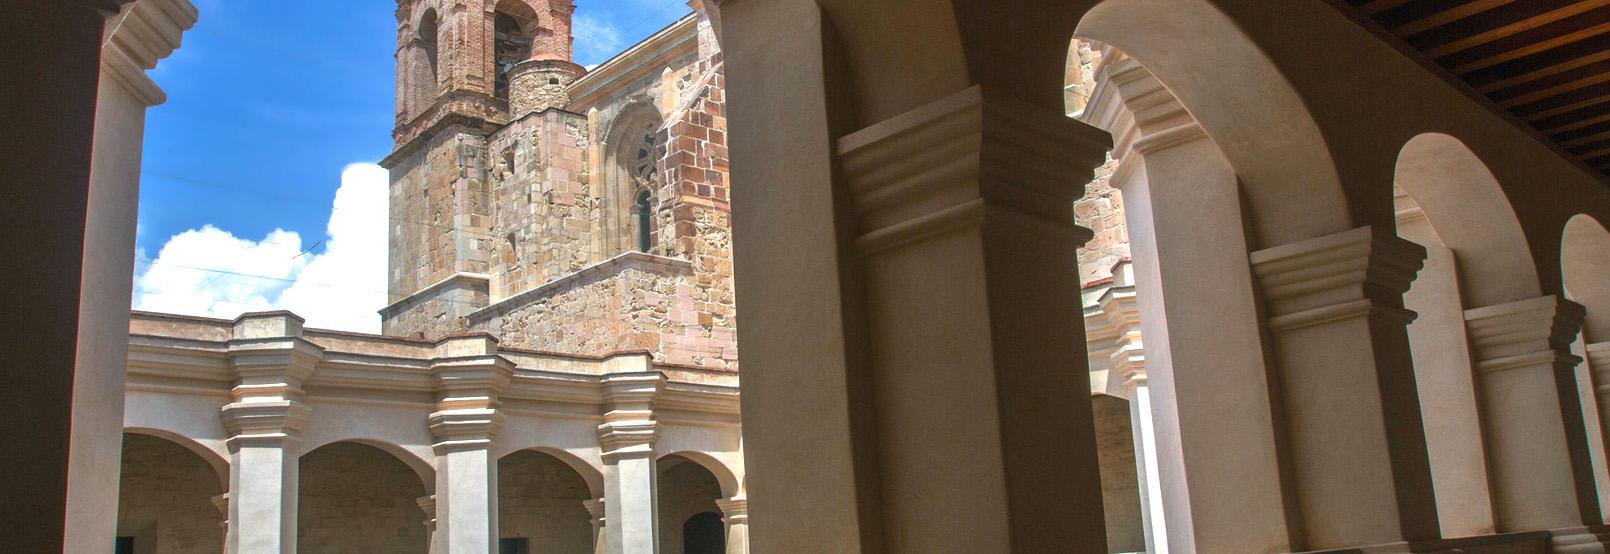 arquitectura colonial en oaxaca